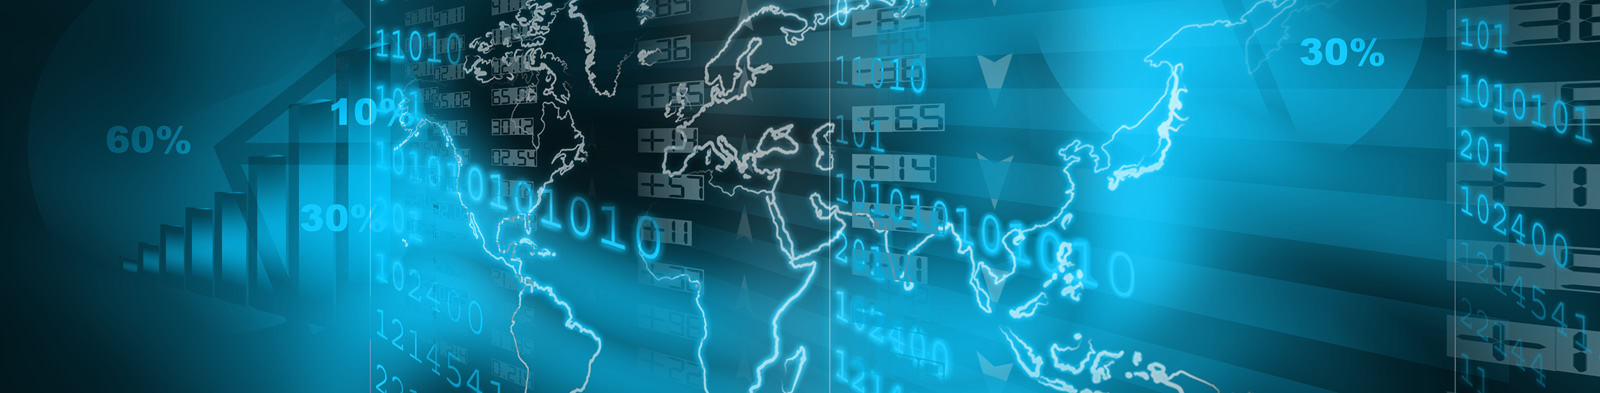 Global merger activity